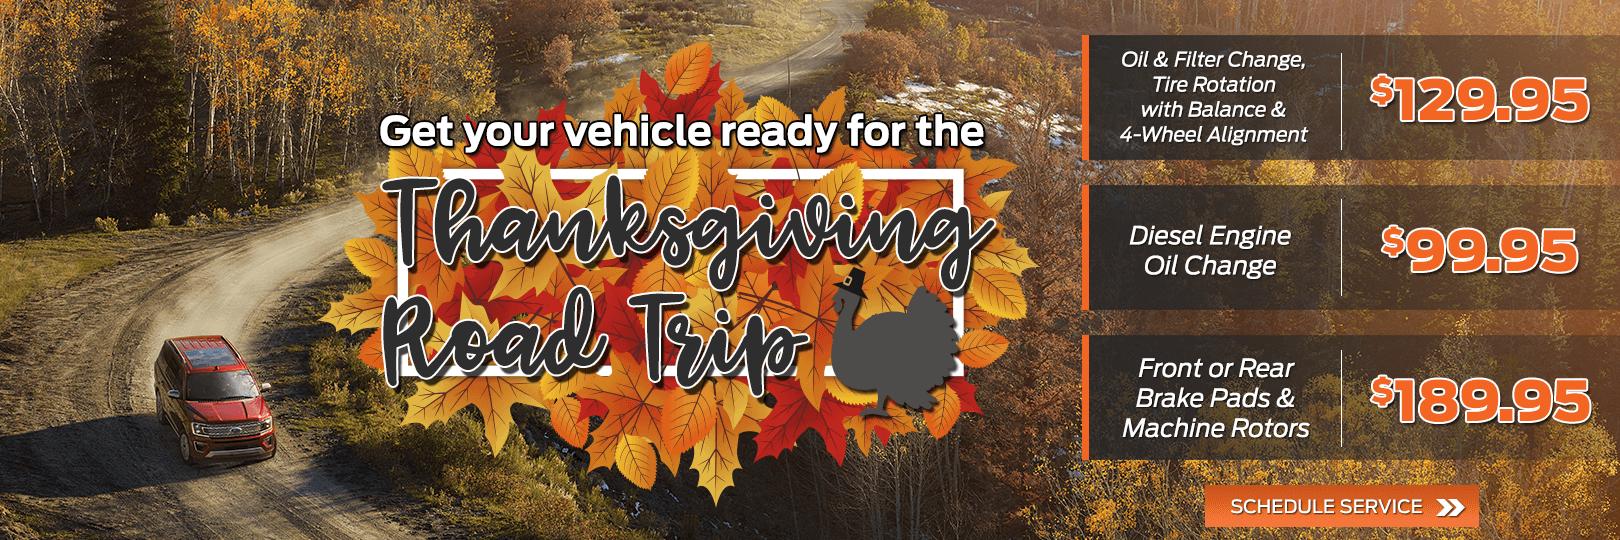 Thanksgiving Road Trip Service Specials